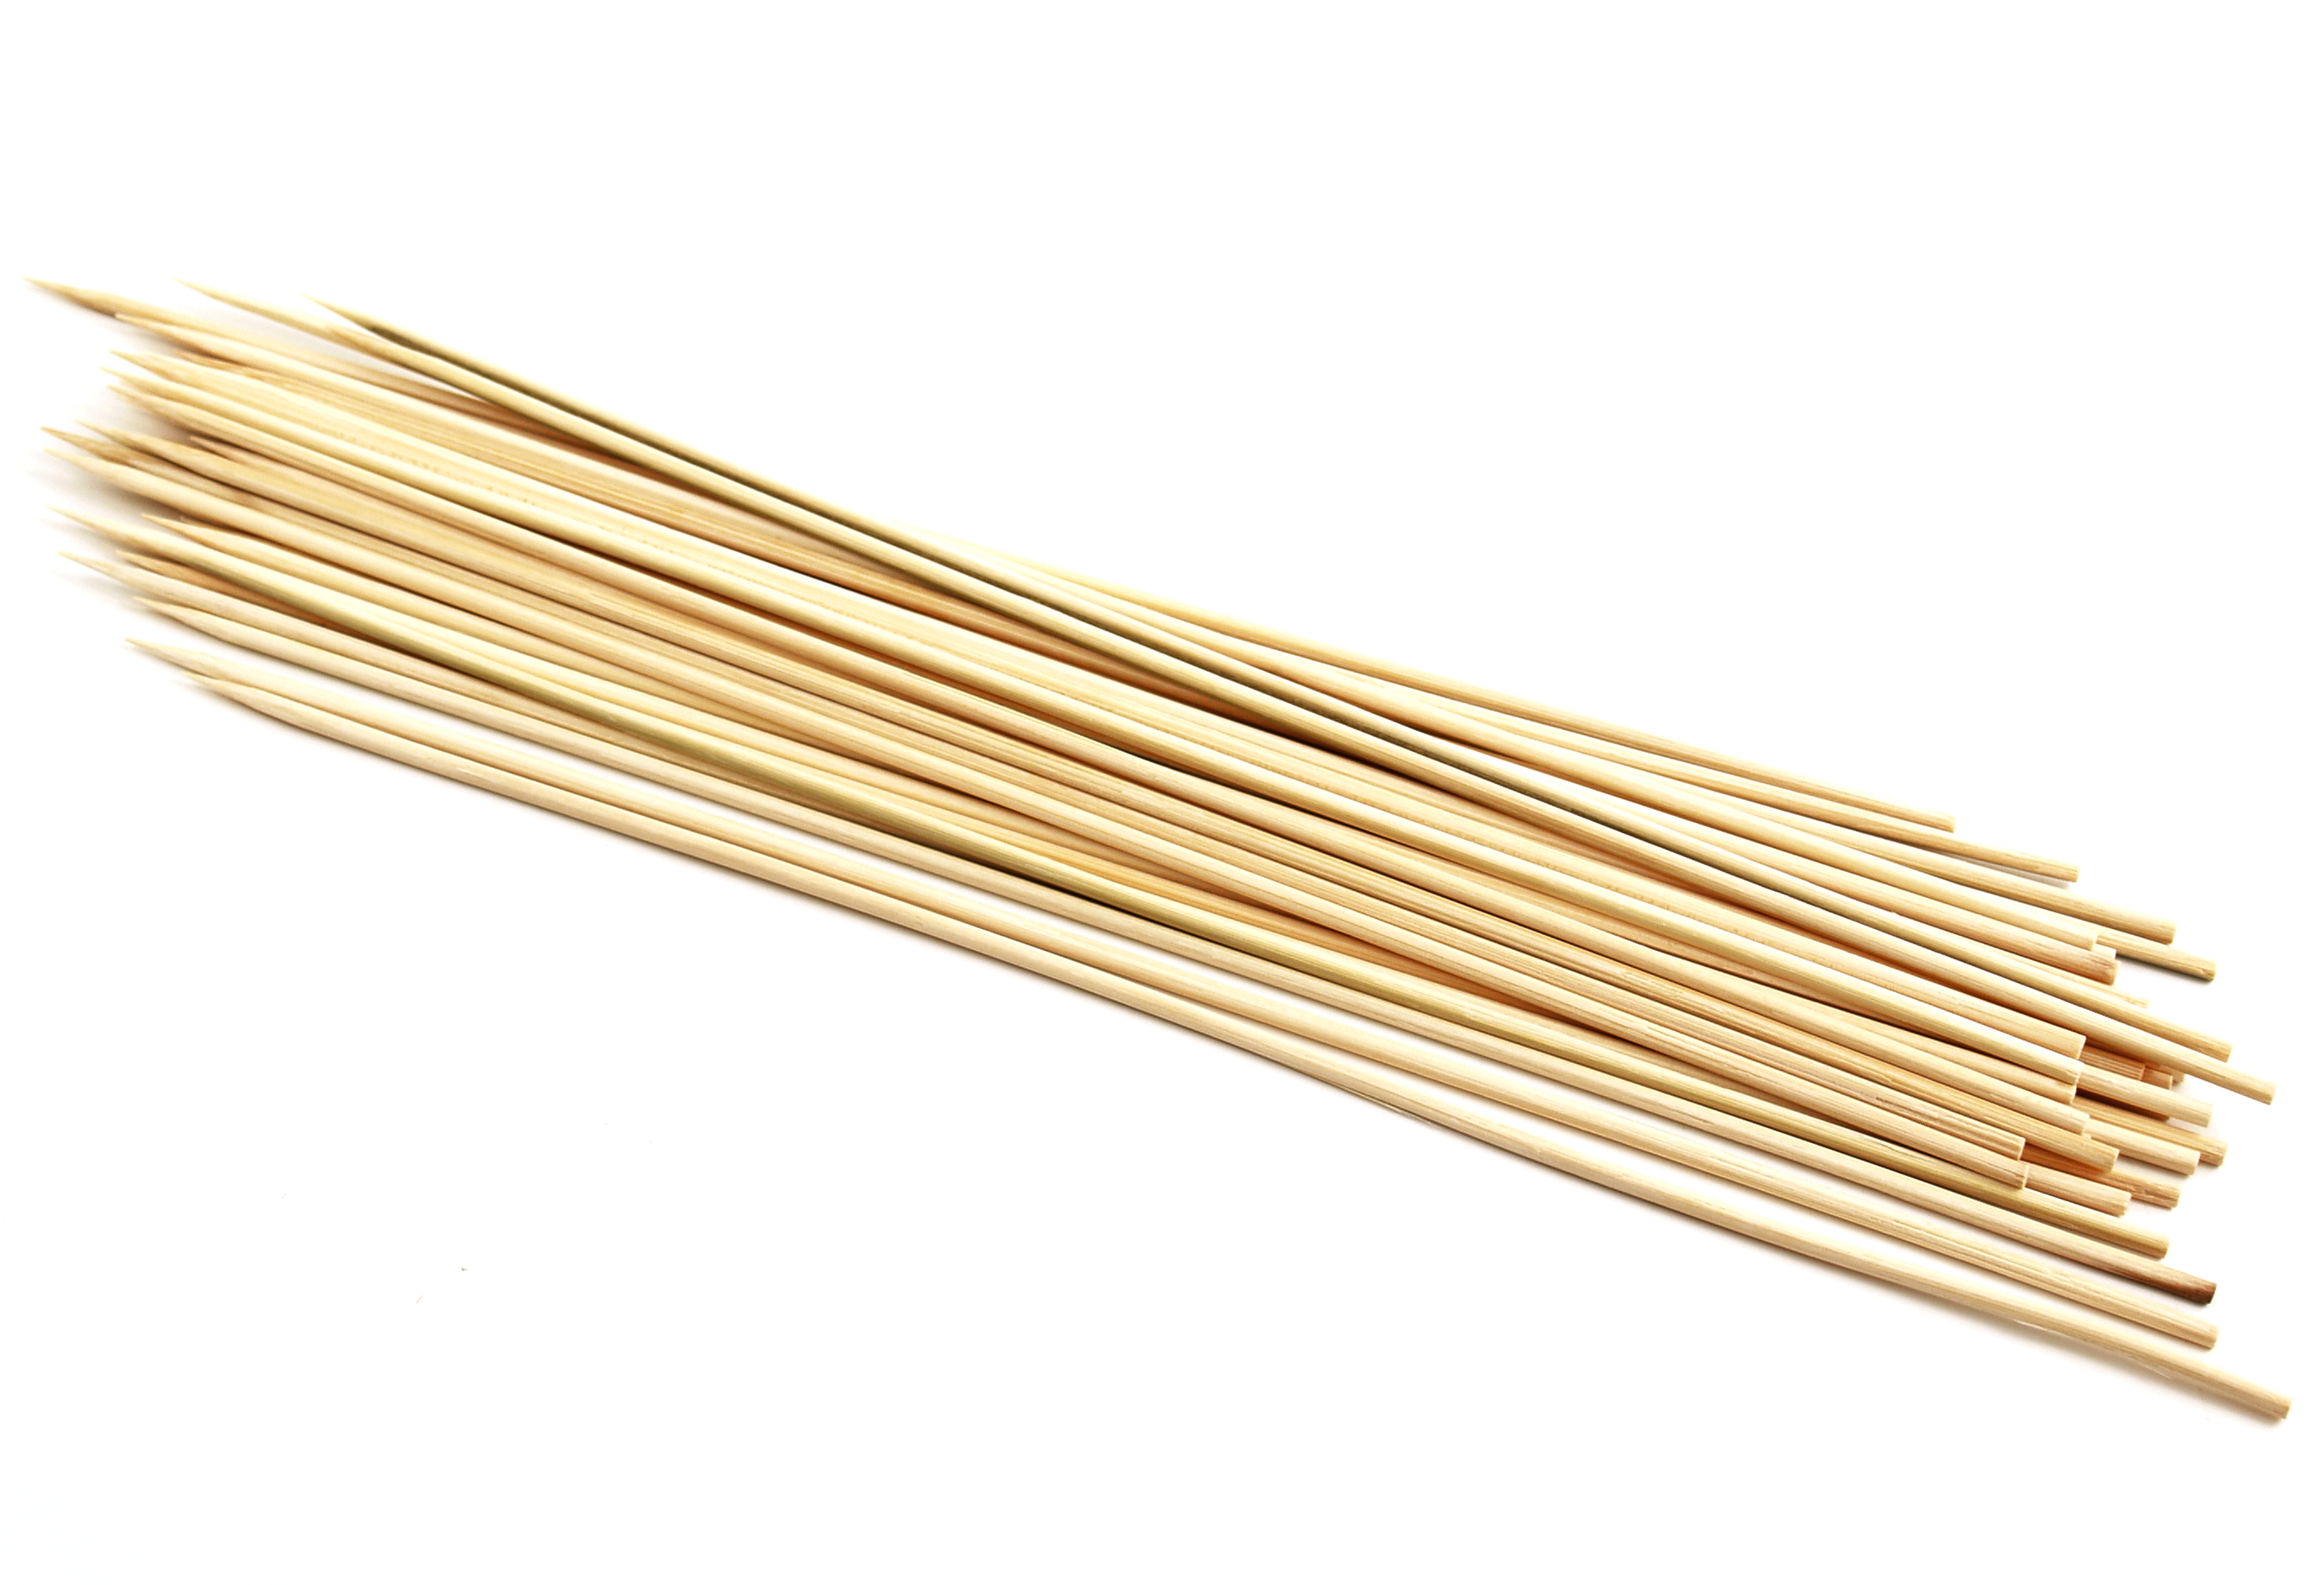 Kingsford Bamboo Skewer, Set of 100